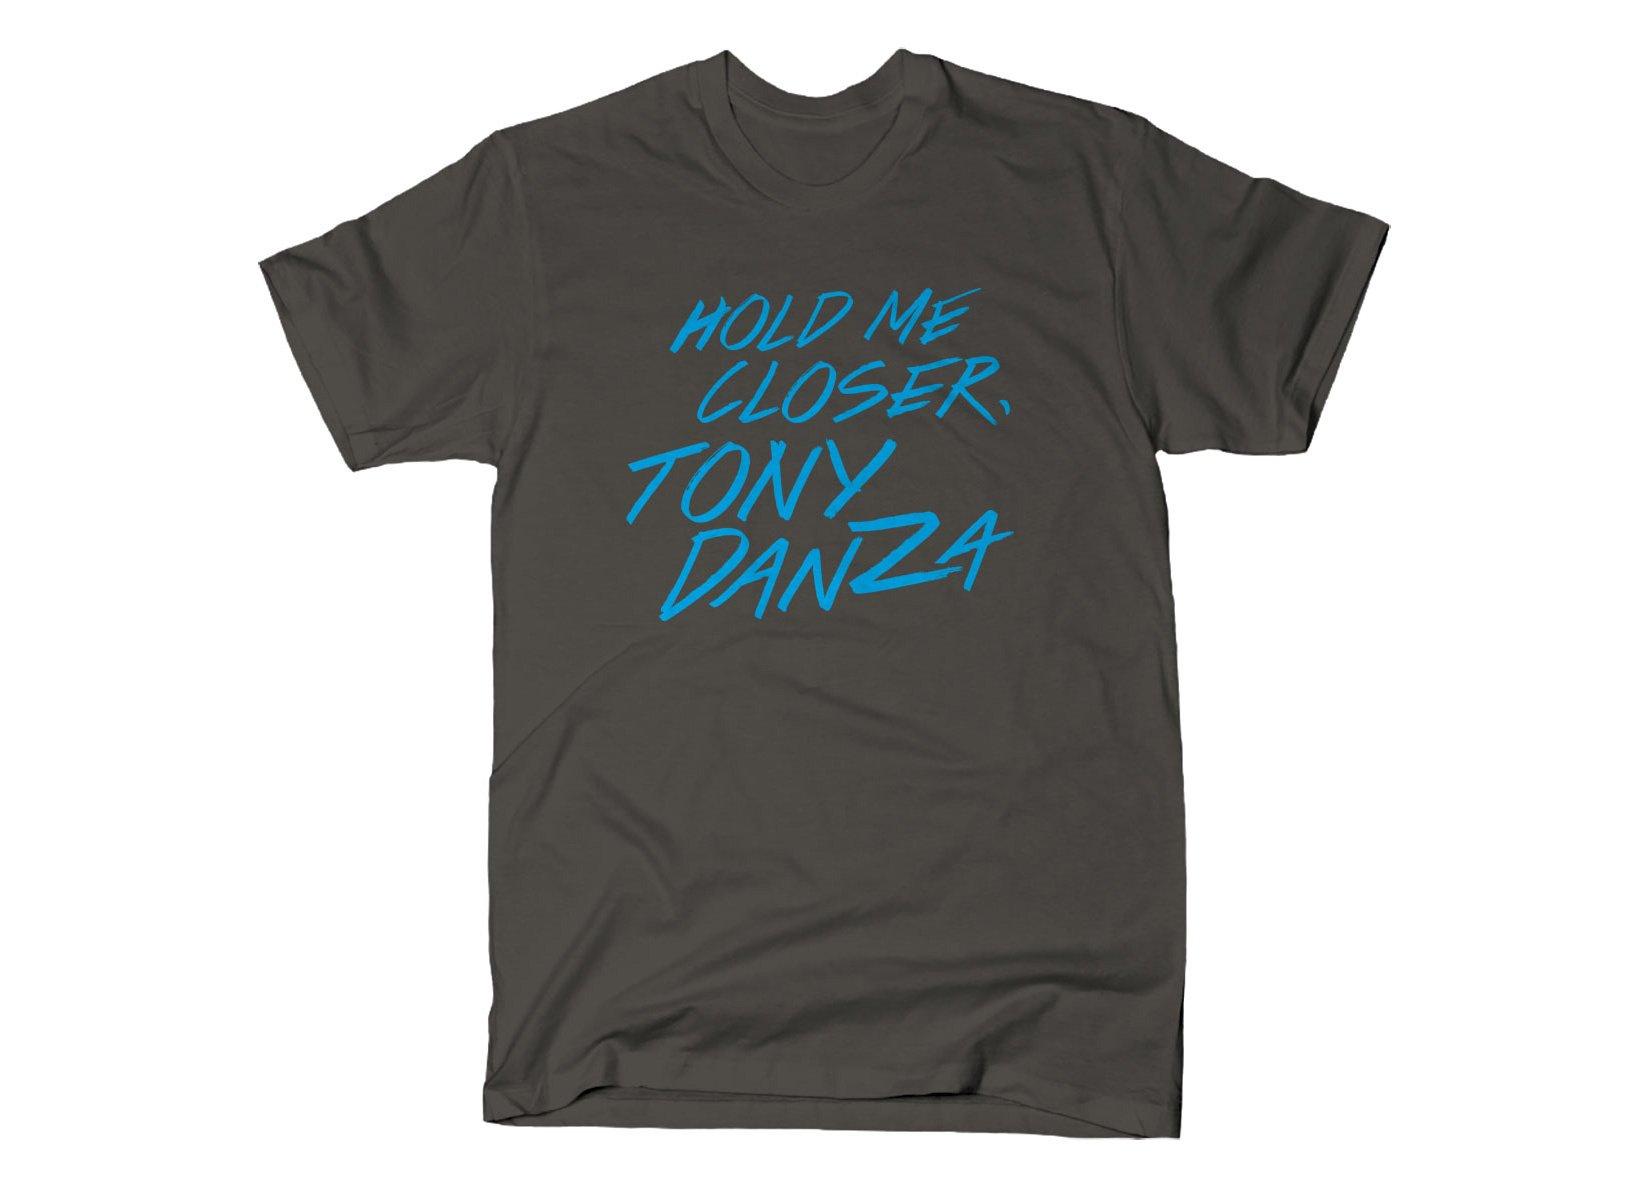 Hold Me Closer, Tony Danza on Mens T-Shirt